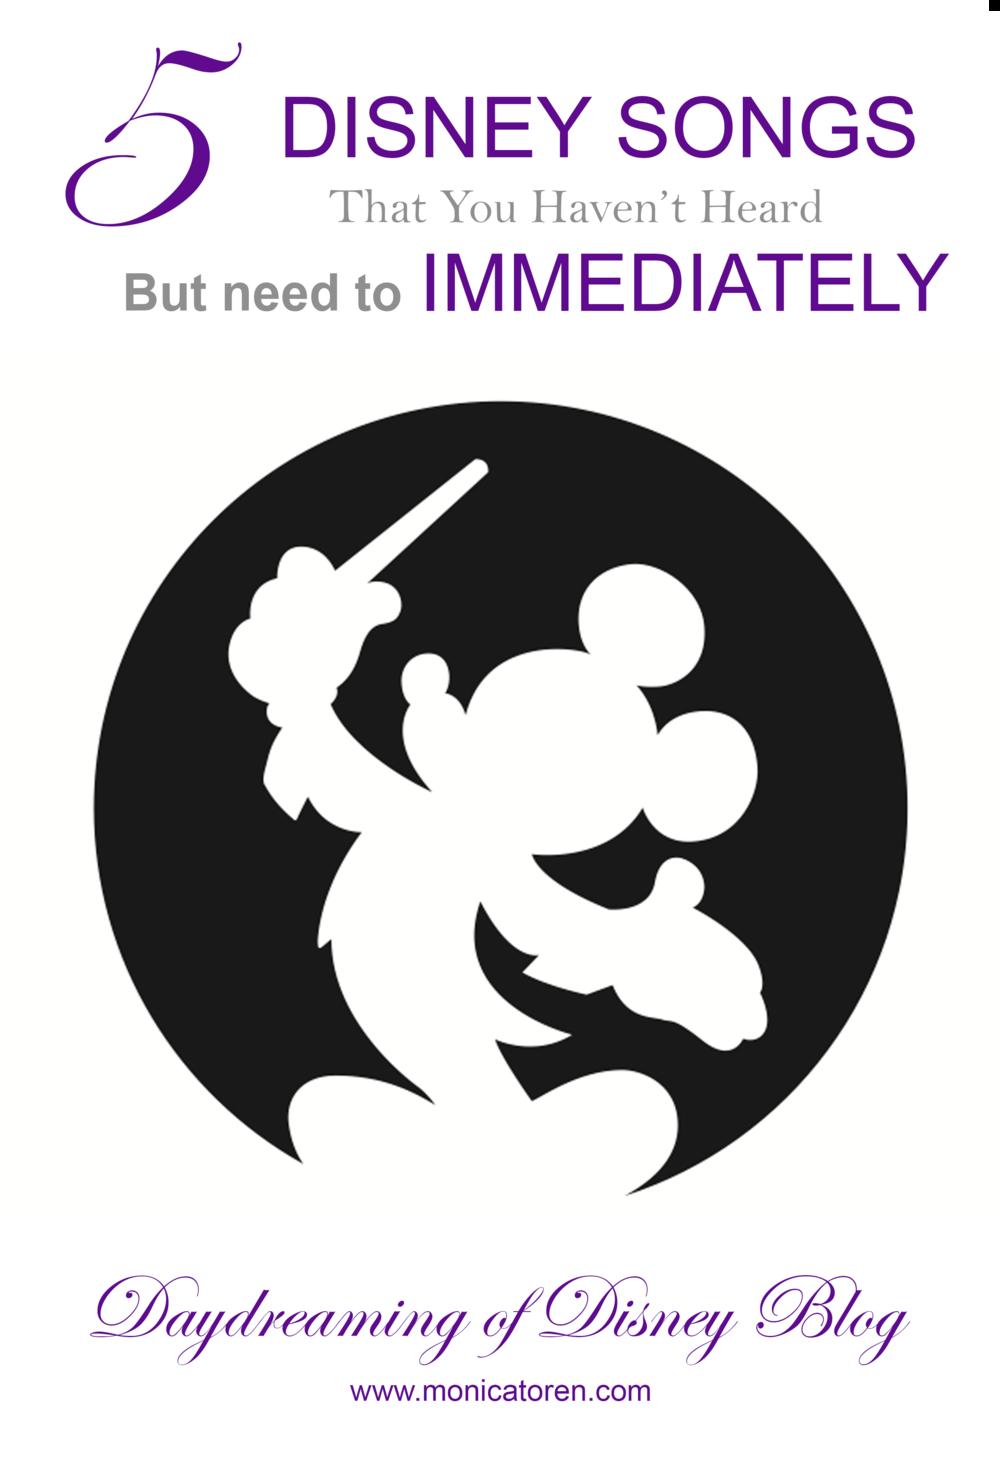 Daydreaming of Disney Blog - 5 Disney Songs That You Haven't Heard, but Need to Immediately - http://www.monicatoren.com #disney #disneymovie #disneymovies #disneymusic #disneysong